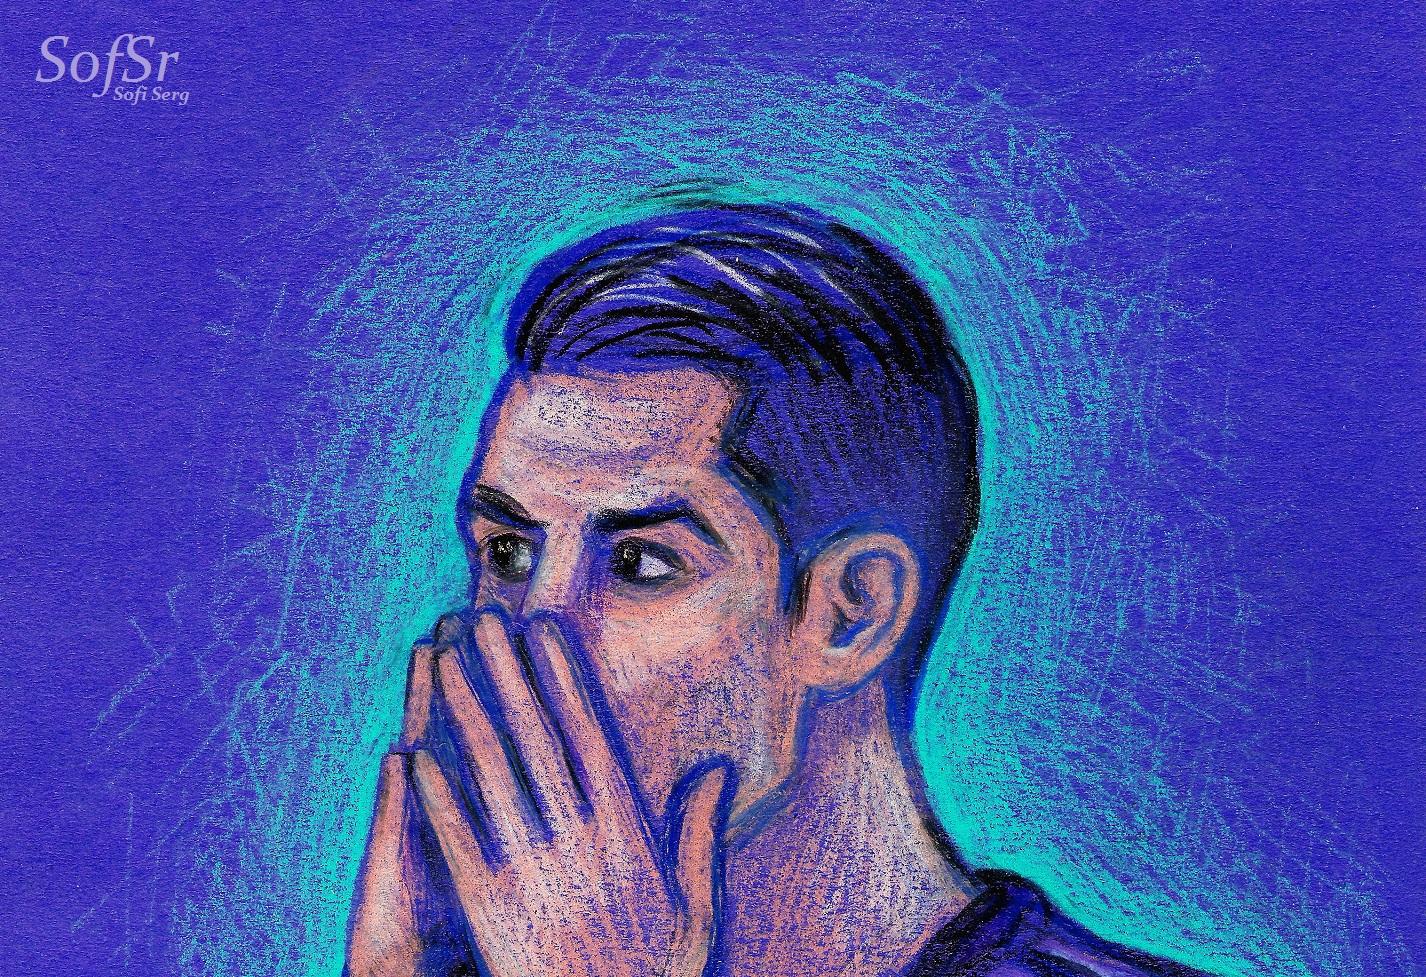 Cristiano Ronaldo. Illustration by Sofi Serg.